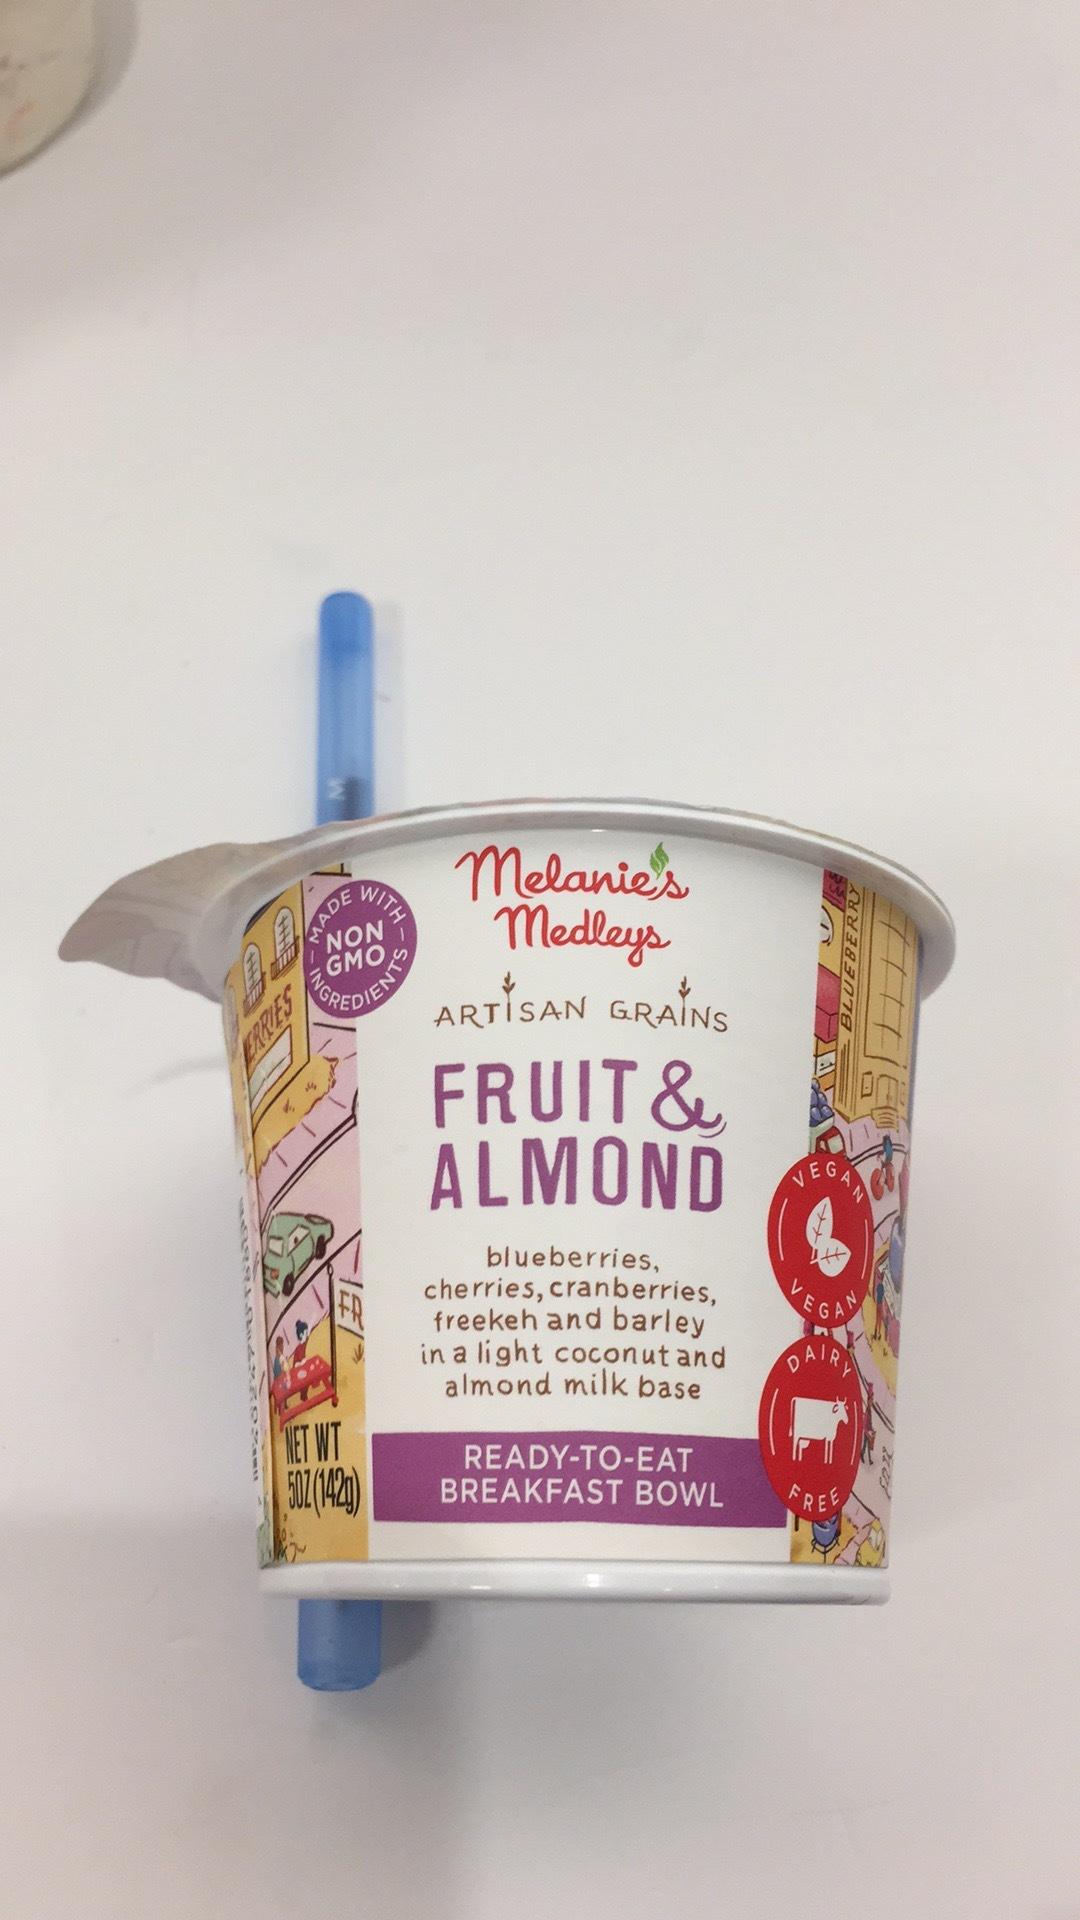 Fruit & Almond Artisan Grains Breakfast Bowl | The Natural